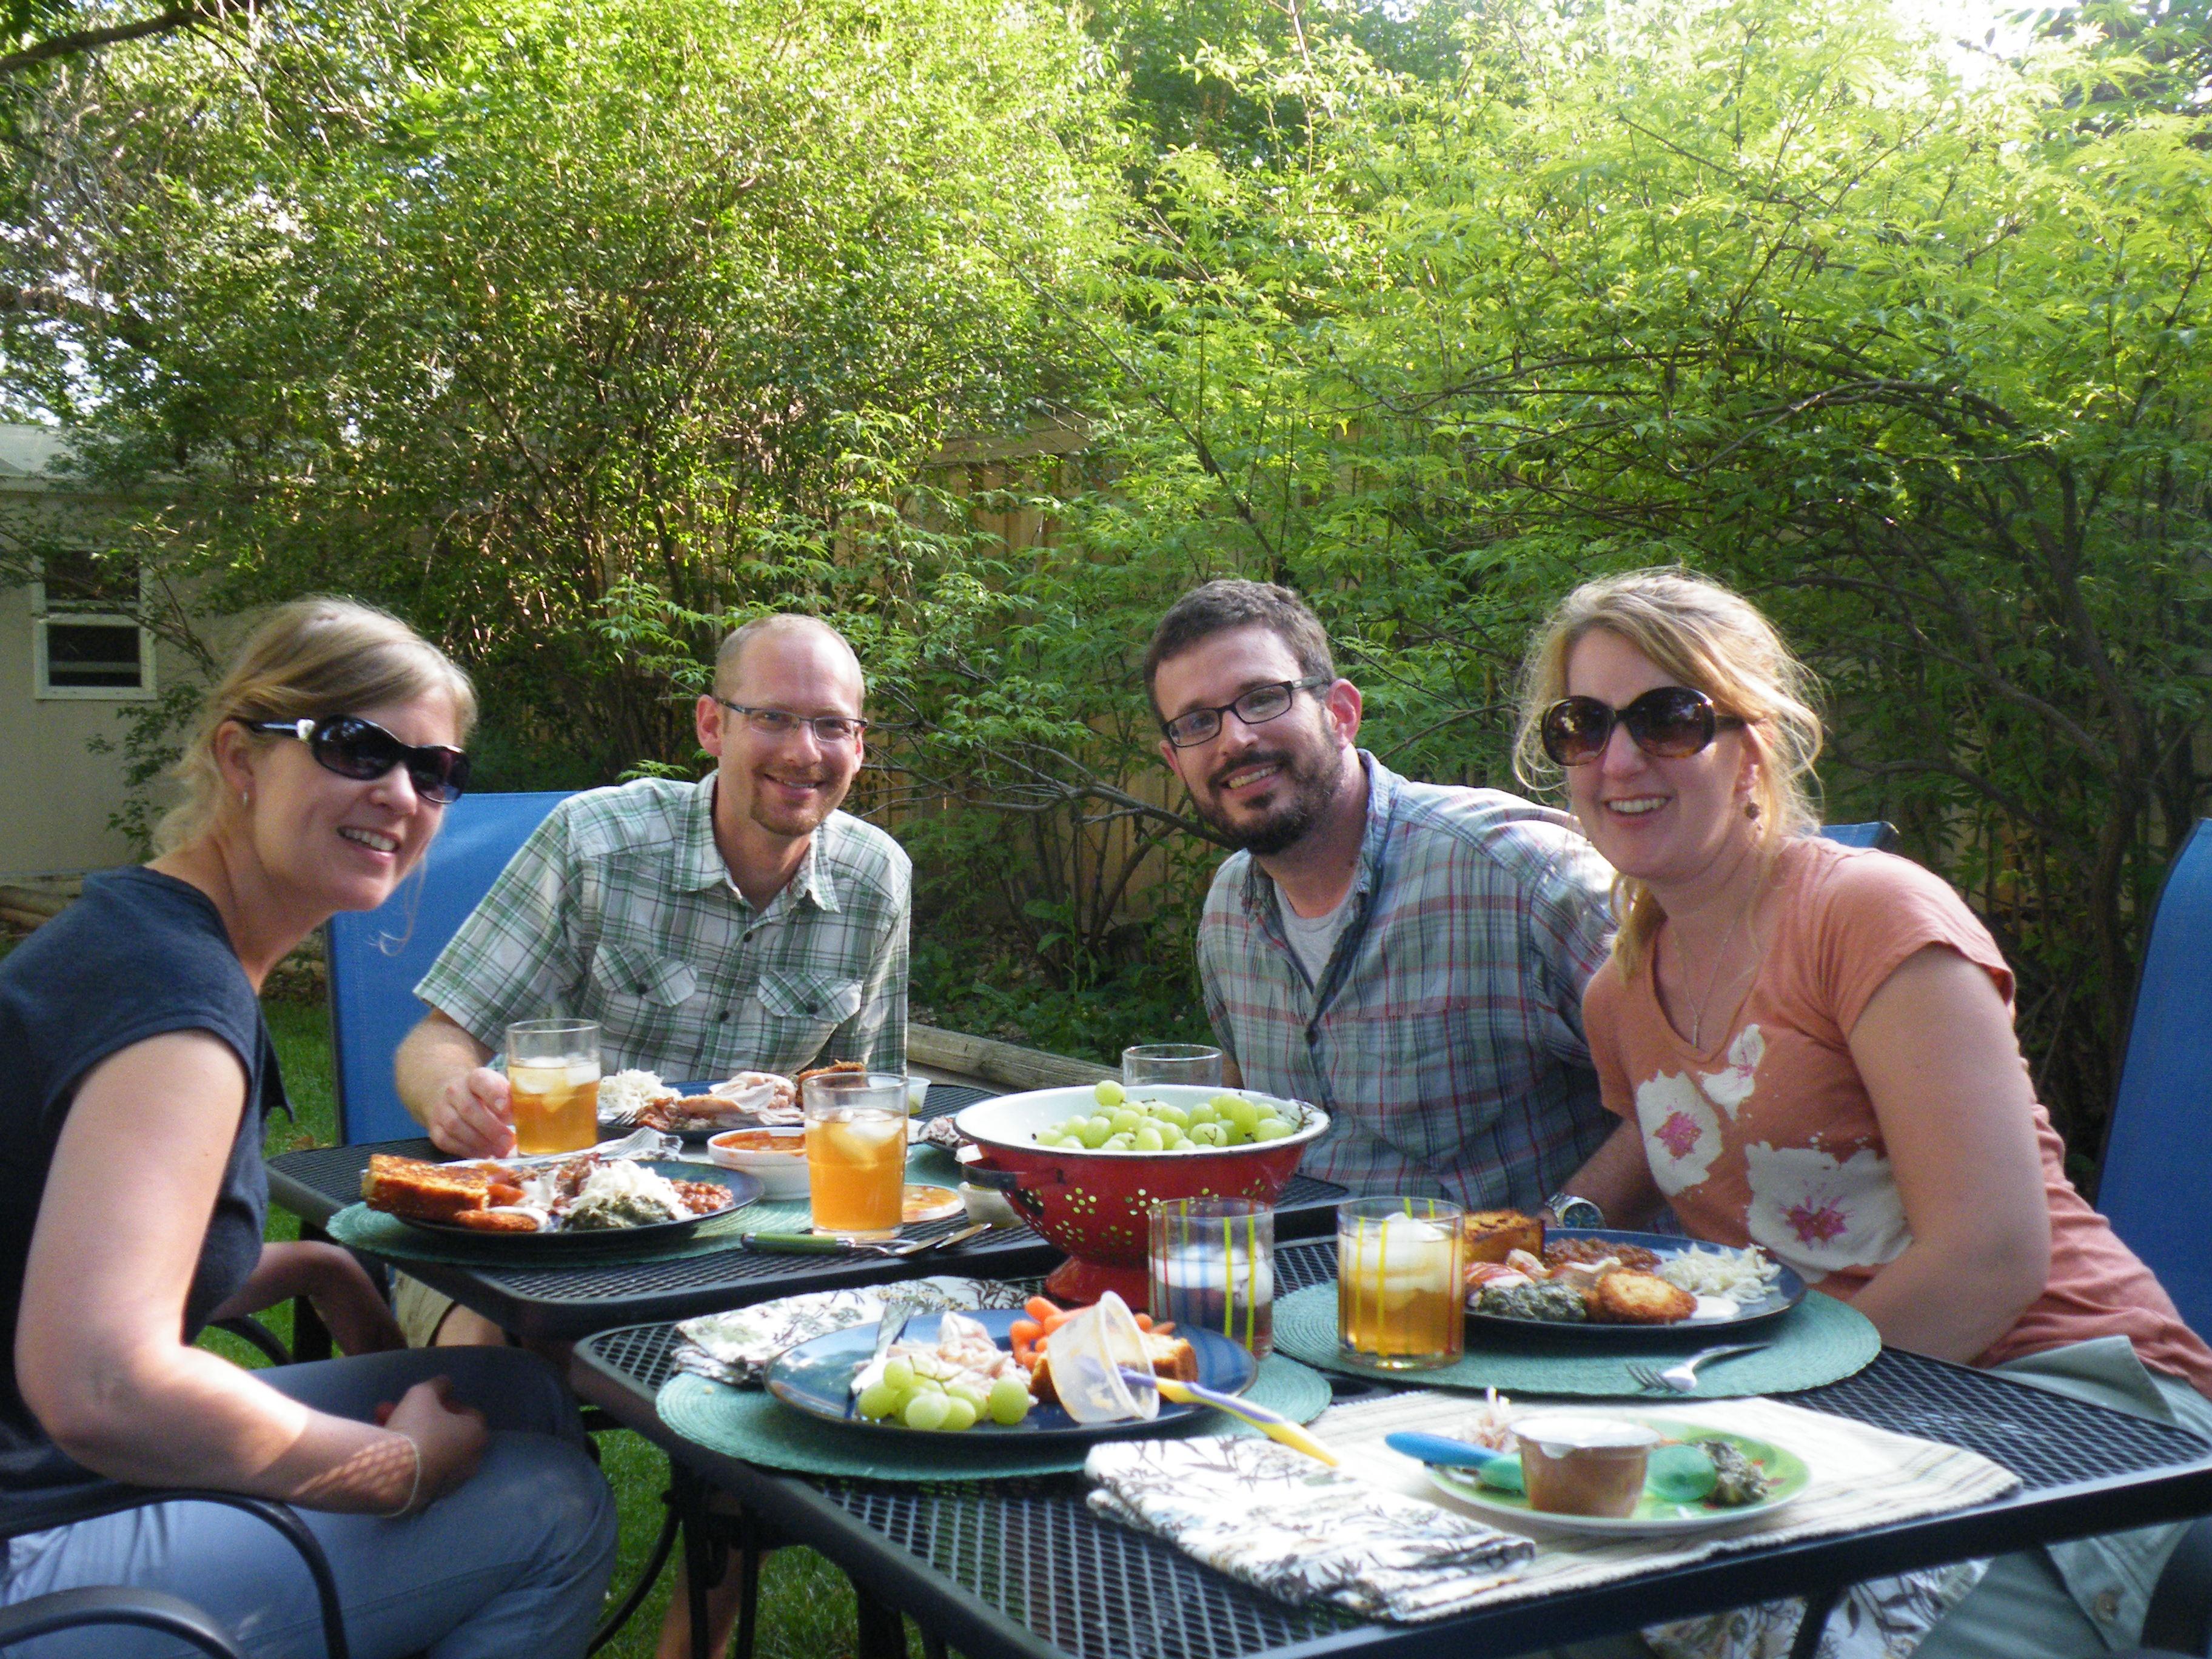 Rocky Mountains  Katrina Woznicki  Share Your Story  A Travelers